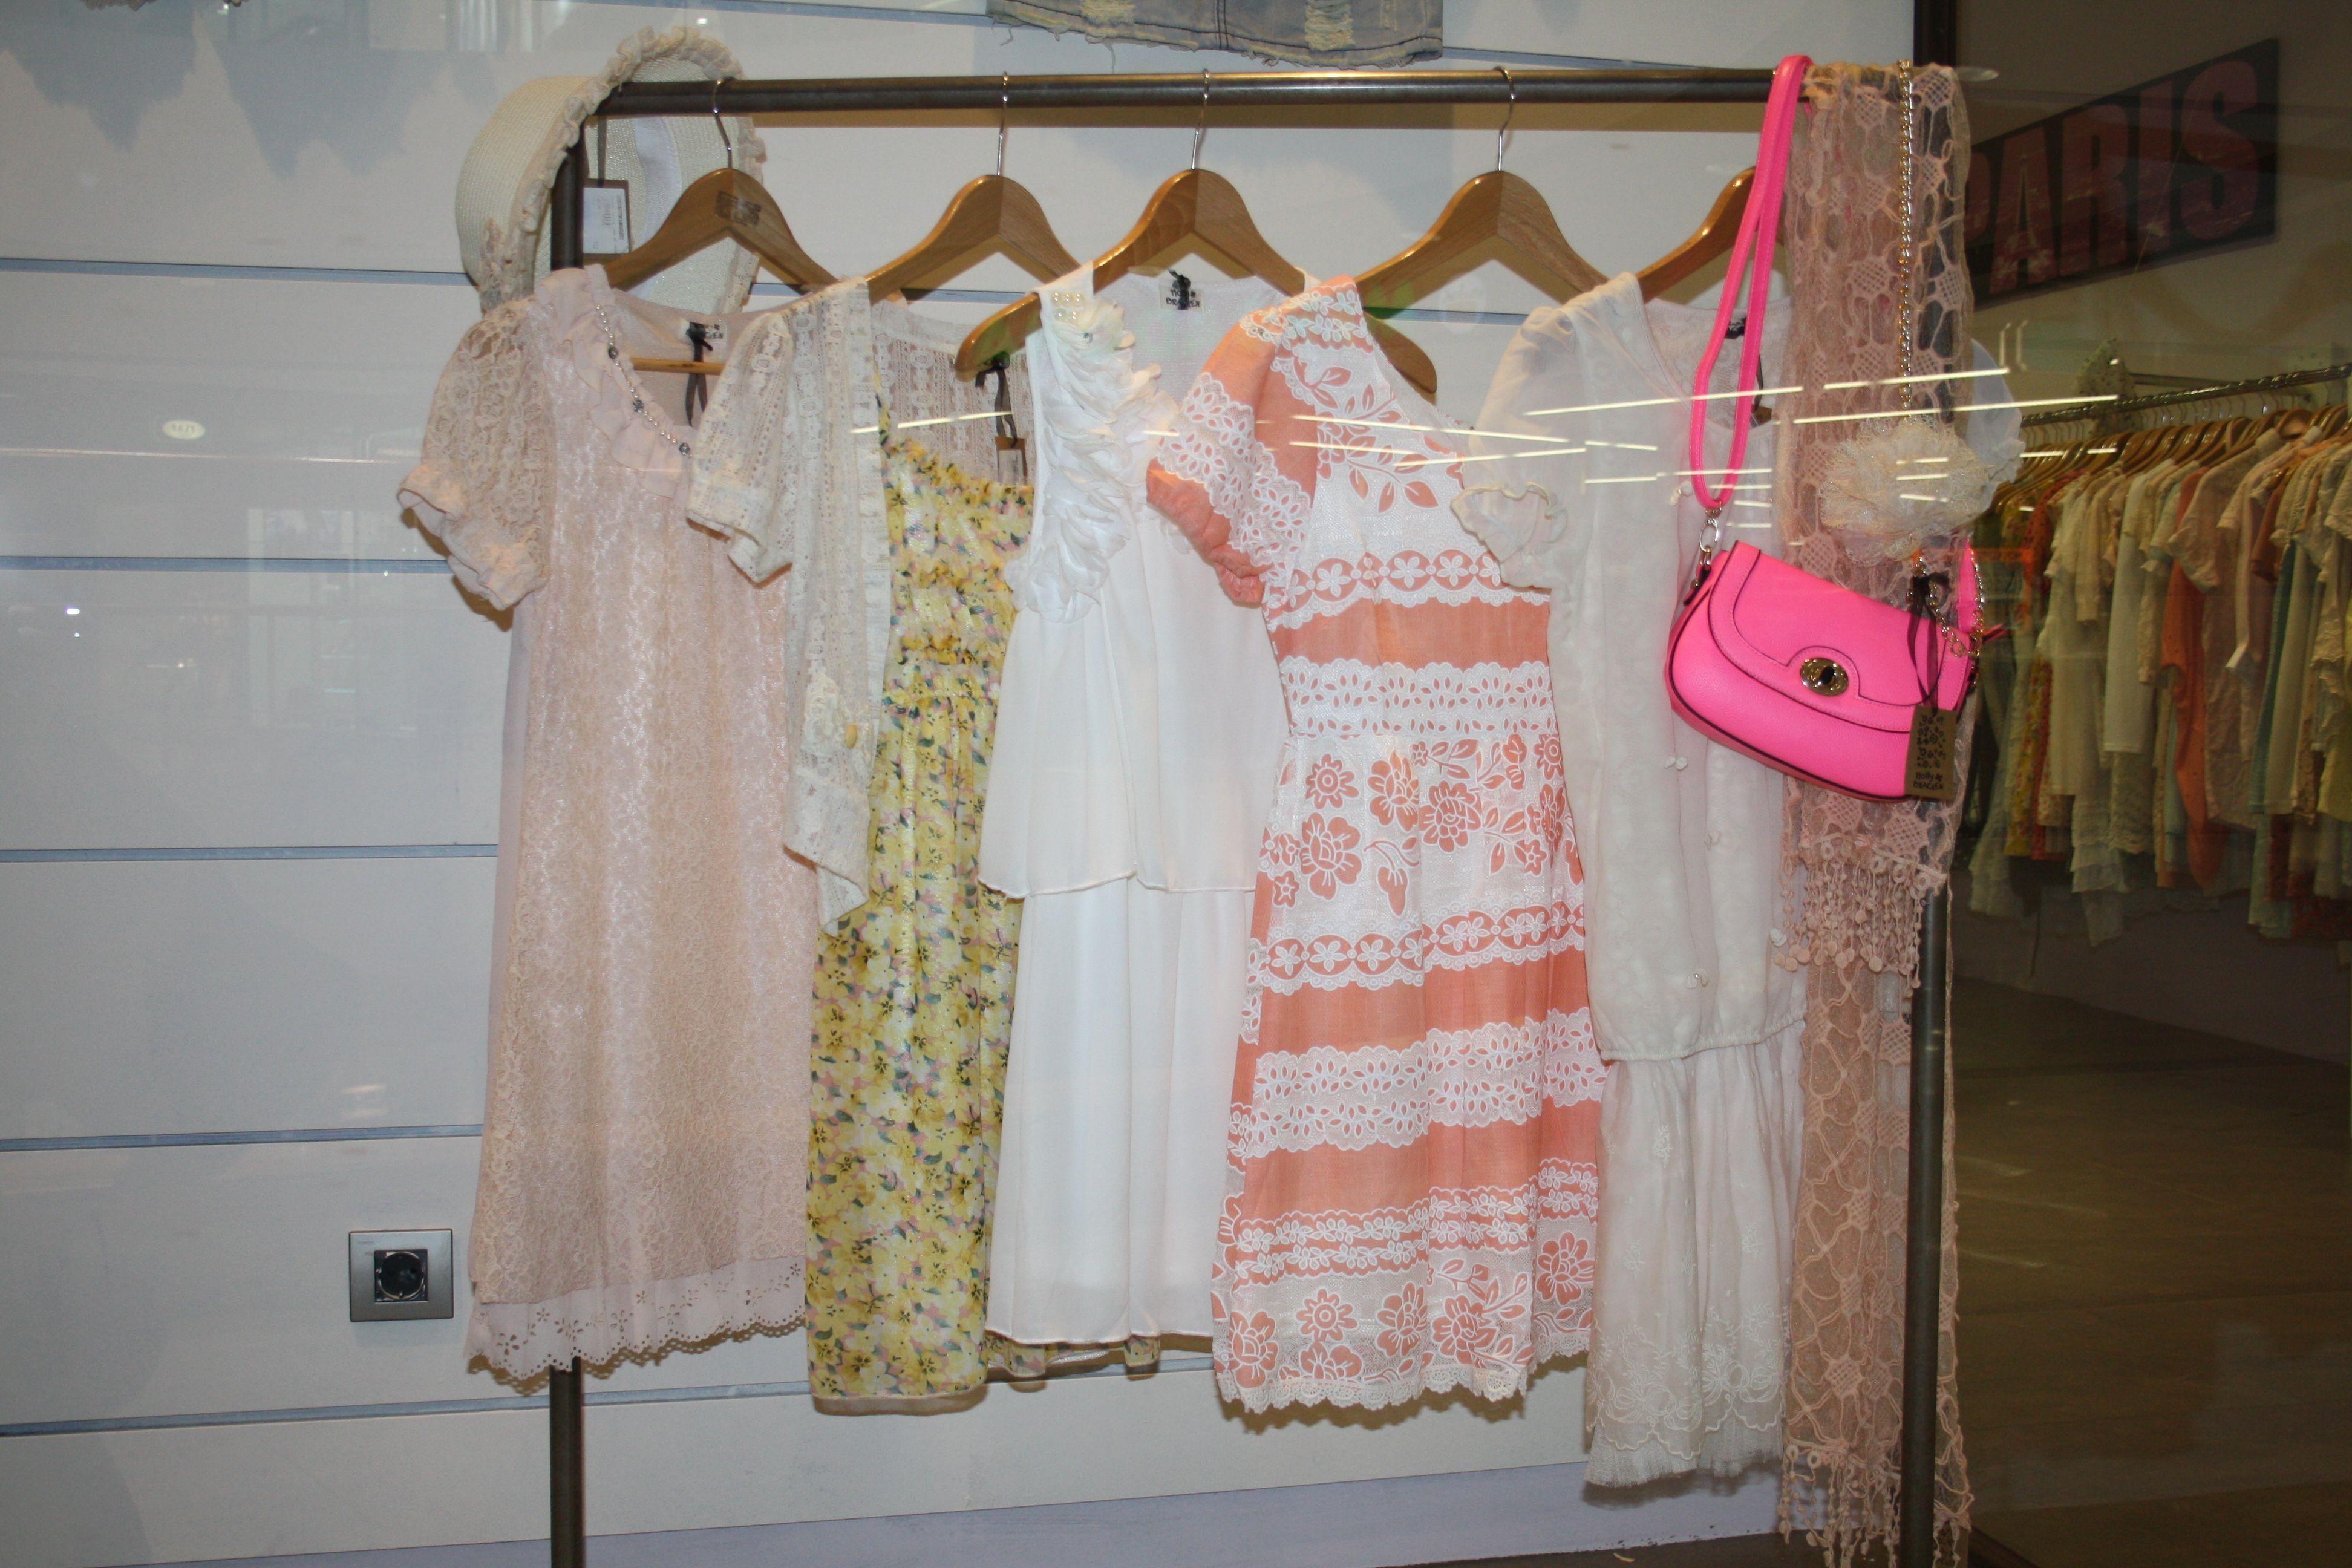 armario francs tiendas vestidos shops dresses